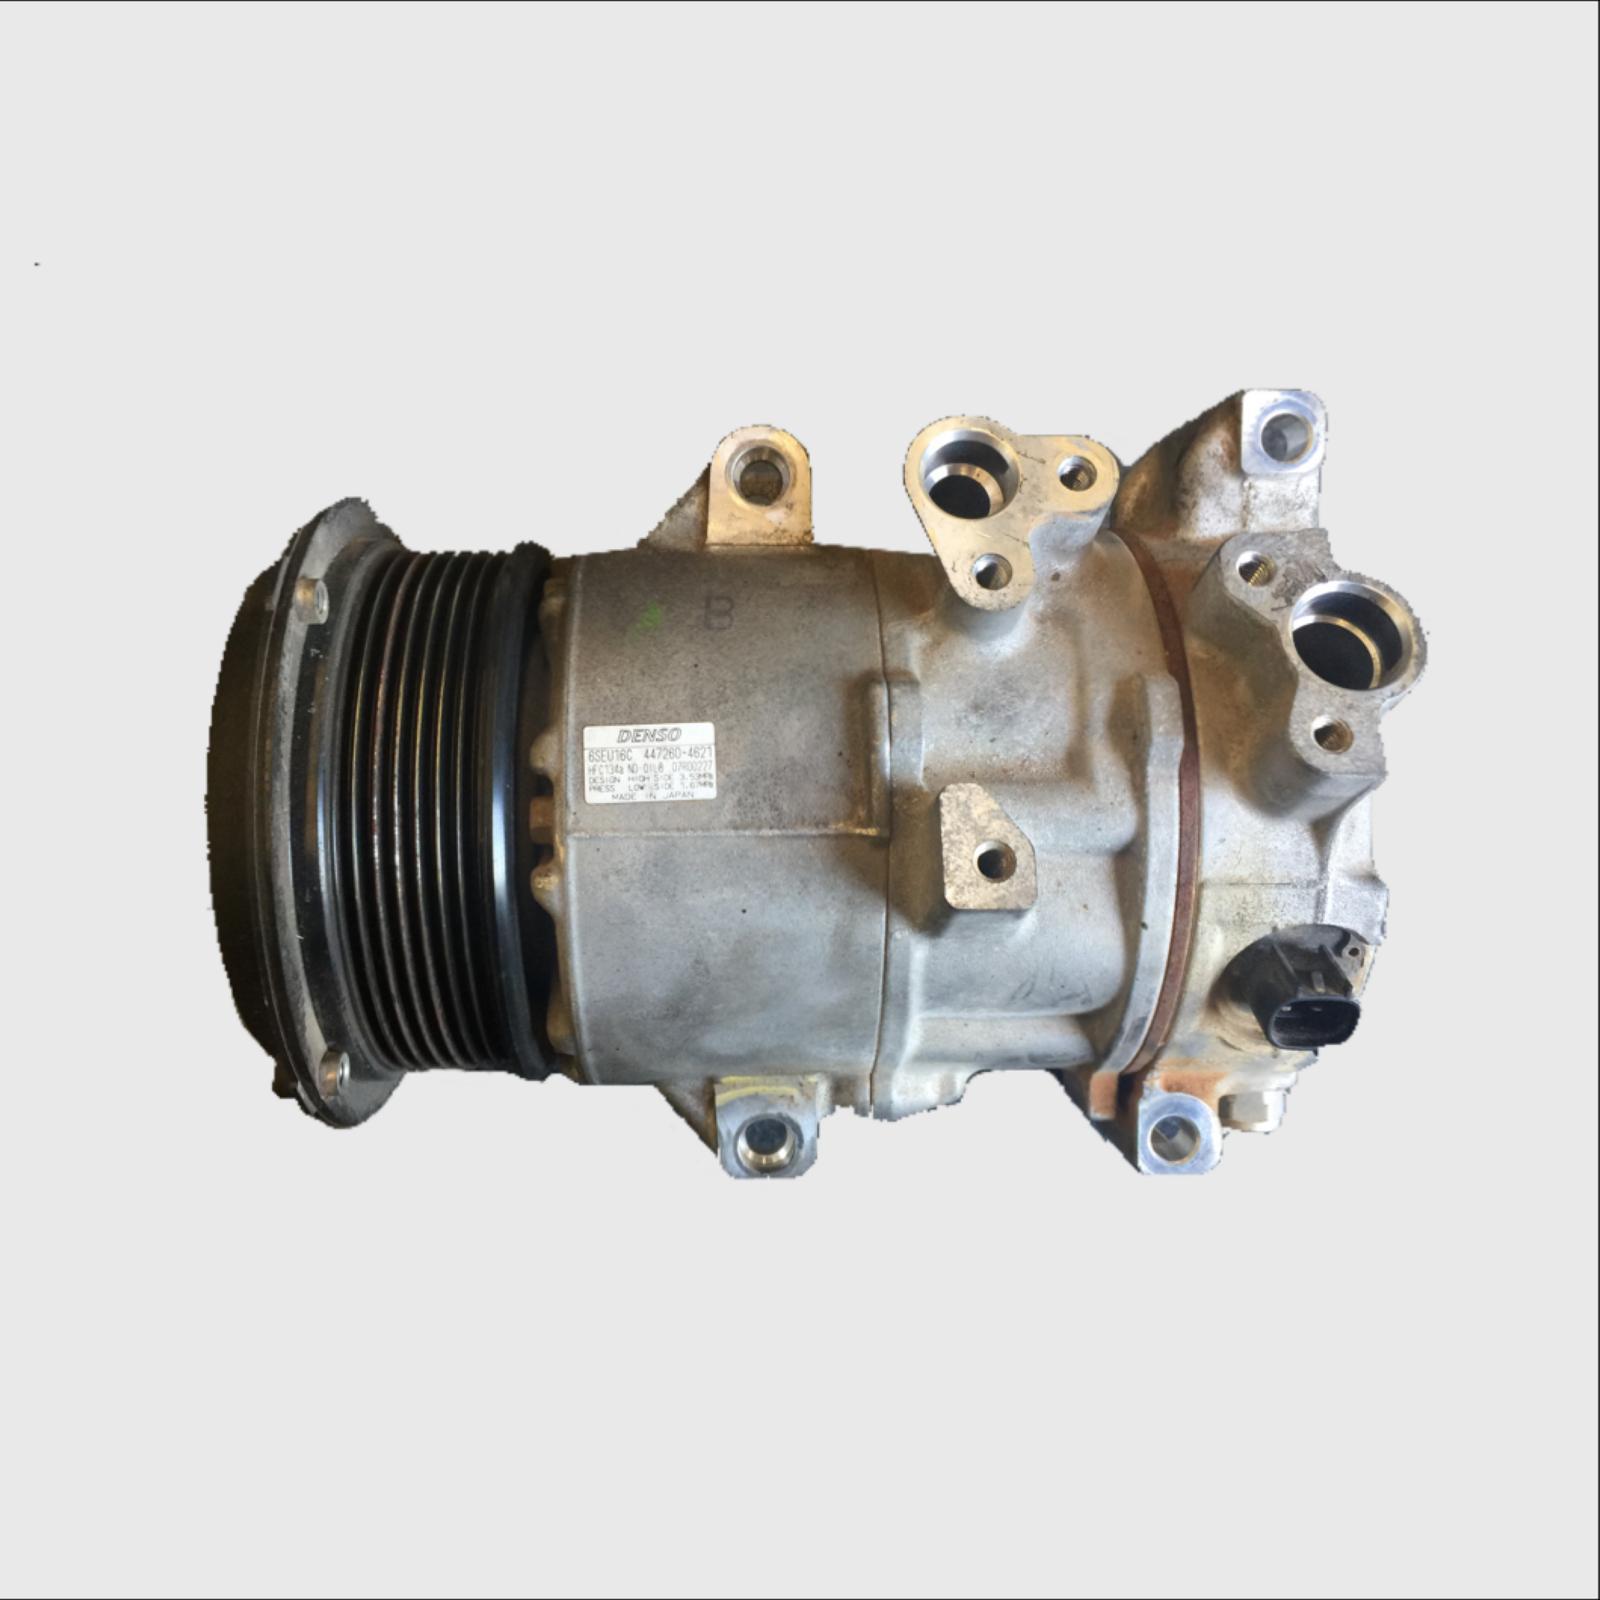 TOYOTA HIACE, A/C Compressor, TRH, 2.7, 2TR-FE, PETROL, 03/05-